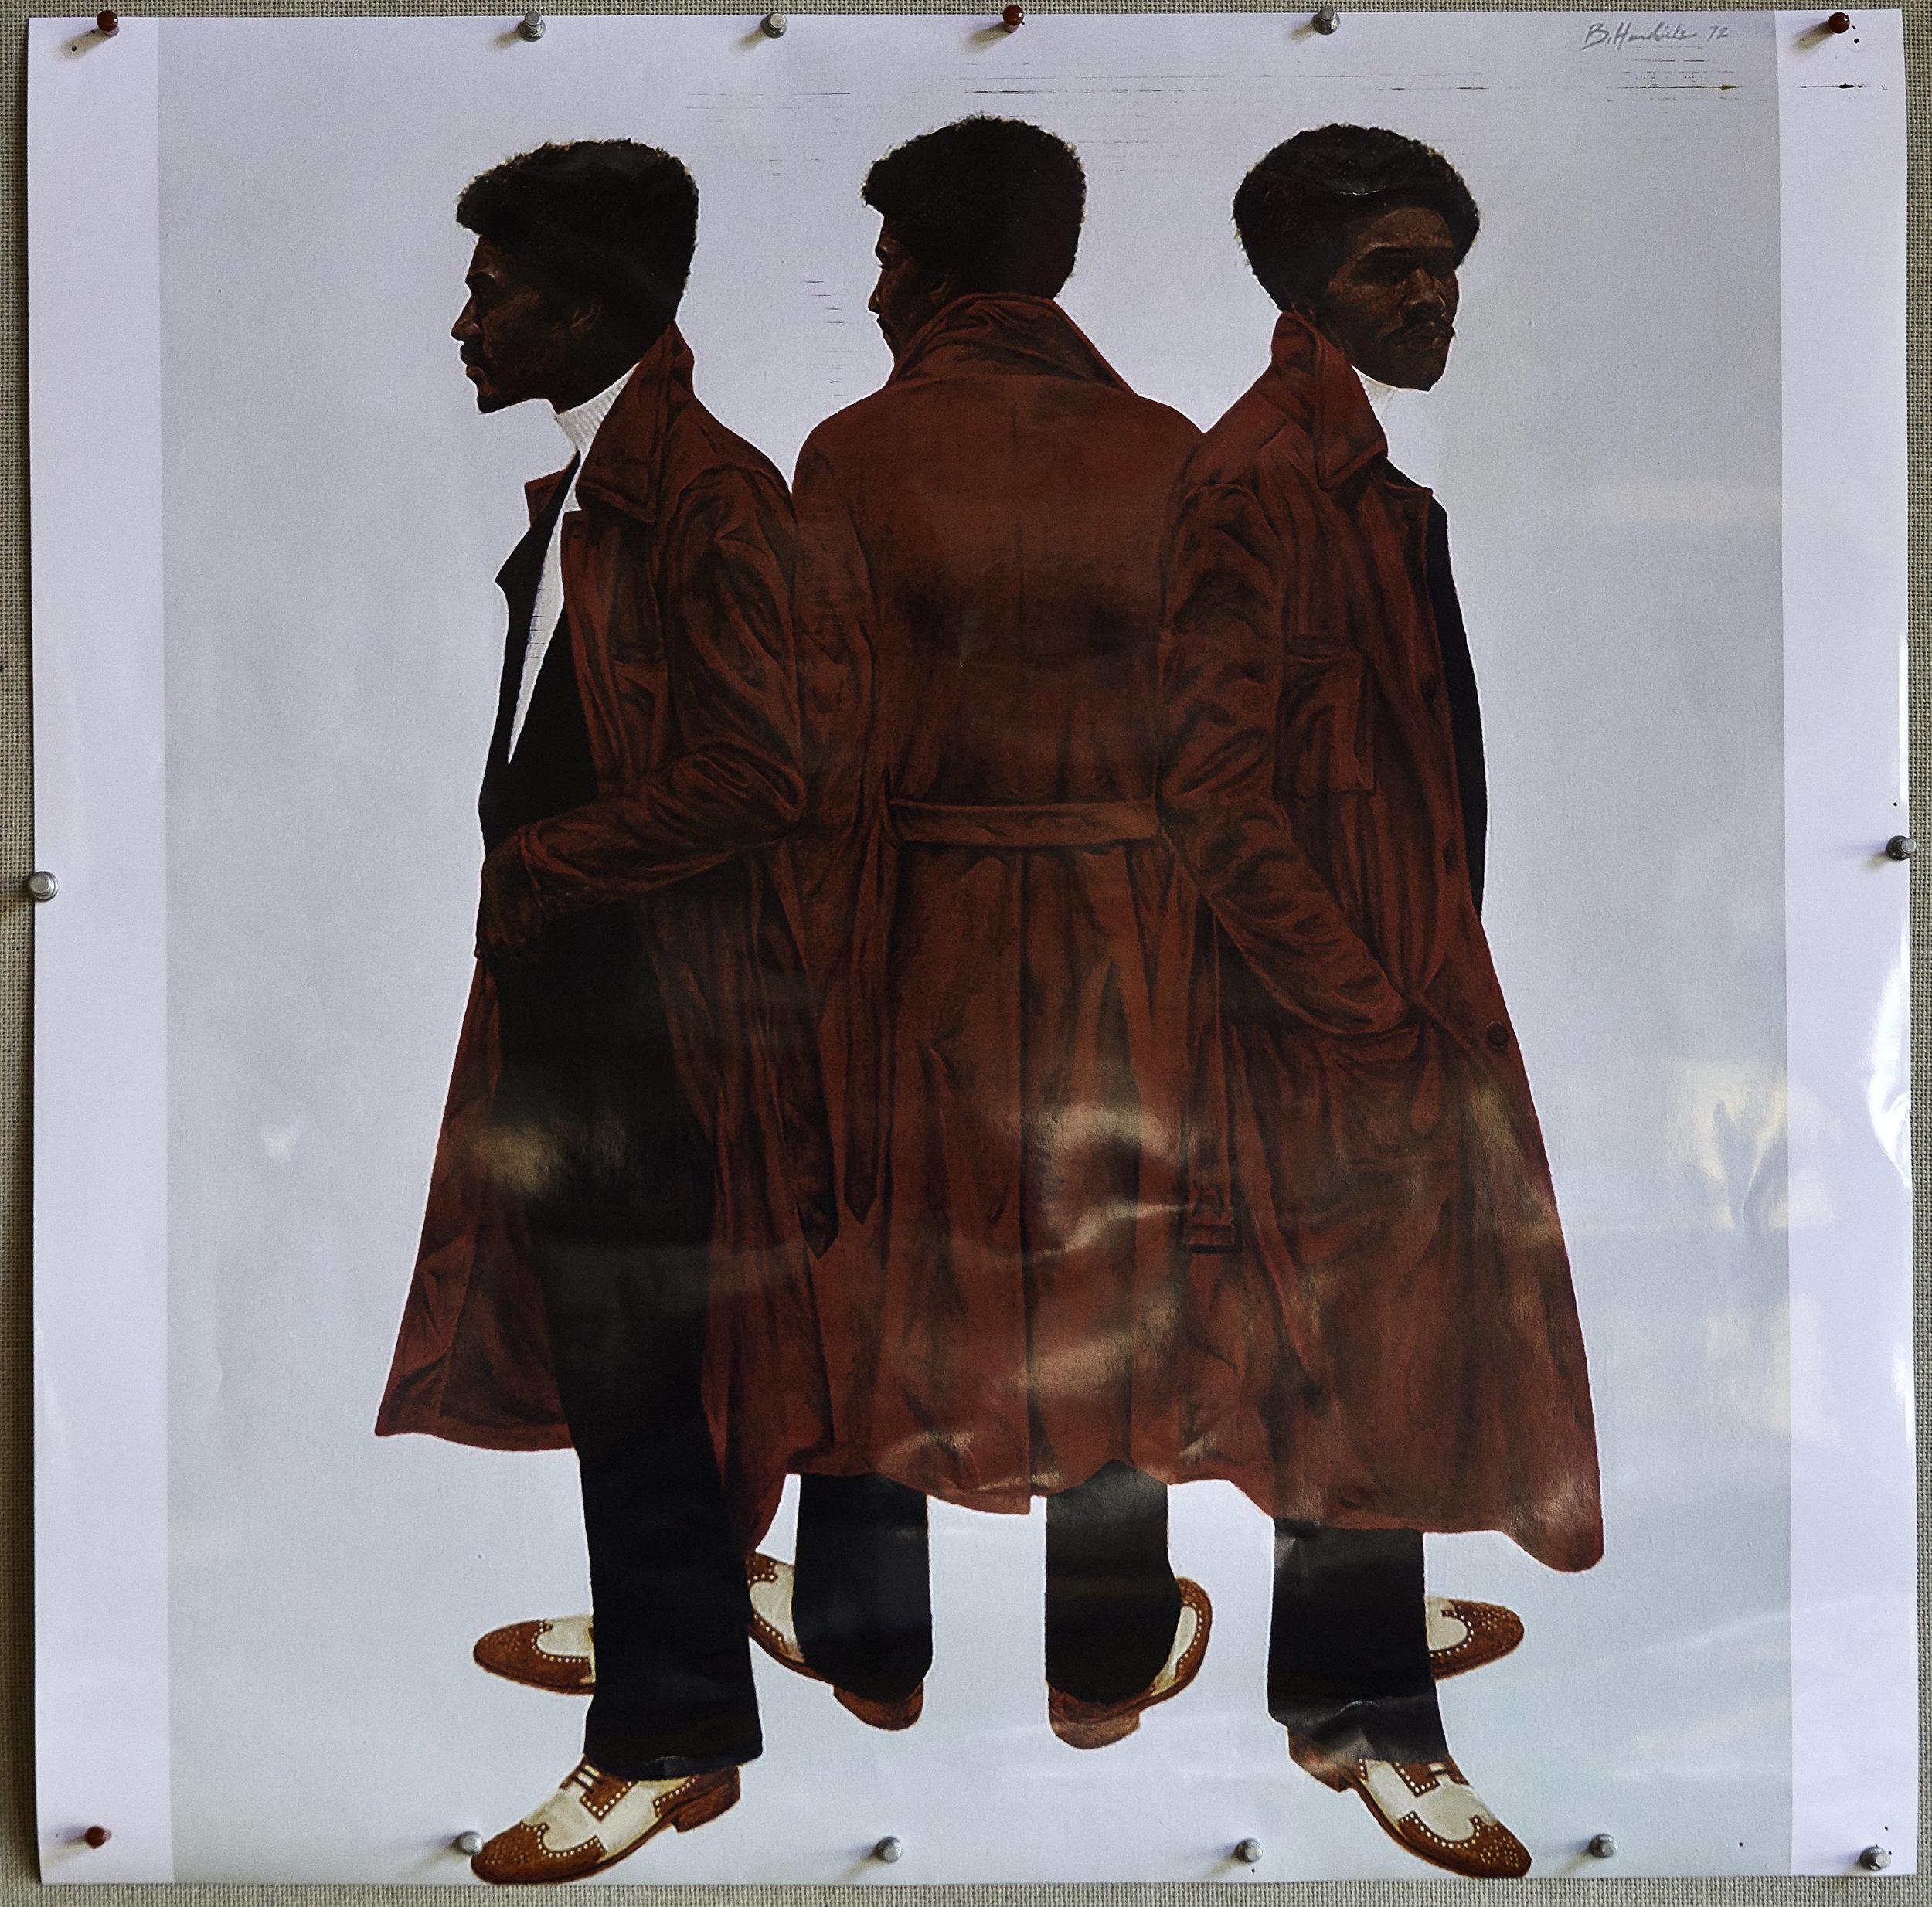 Black History Month Exhibit - Feb 05 2019 - 0080.jpg